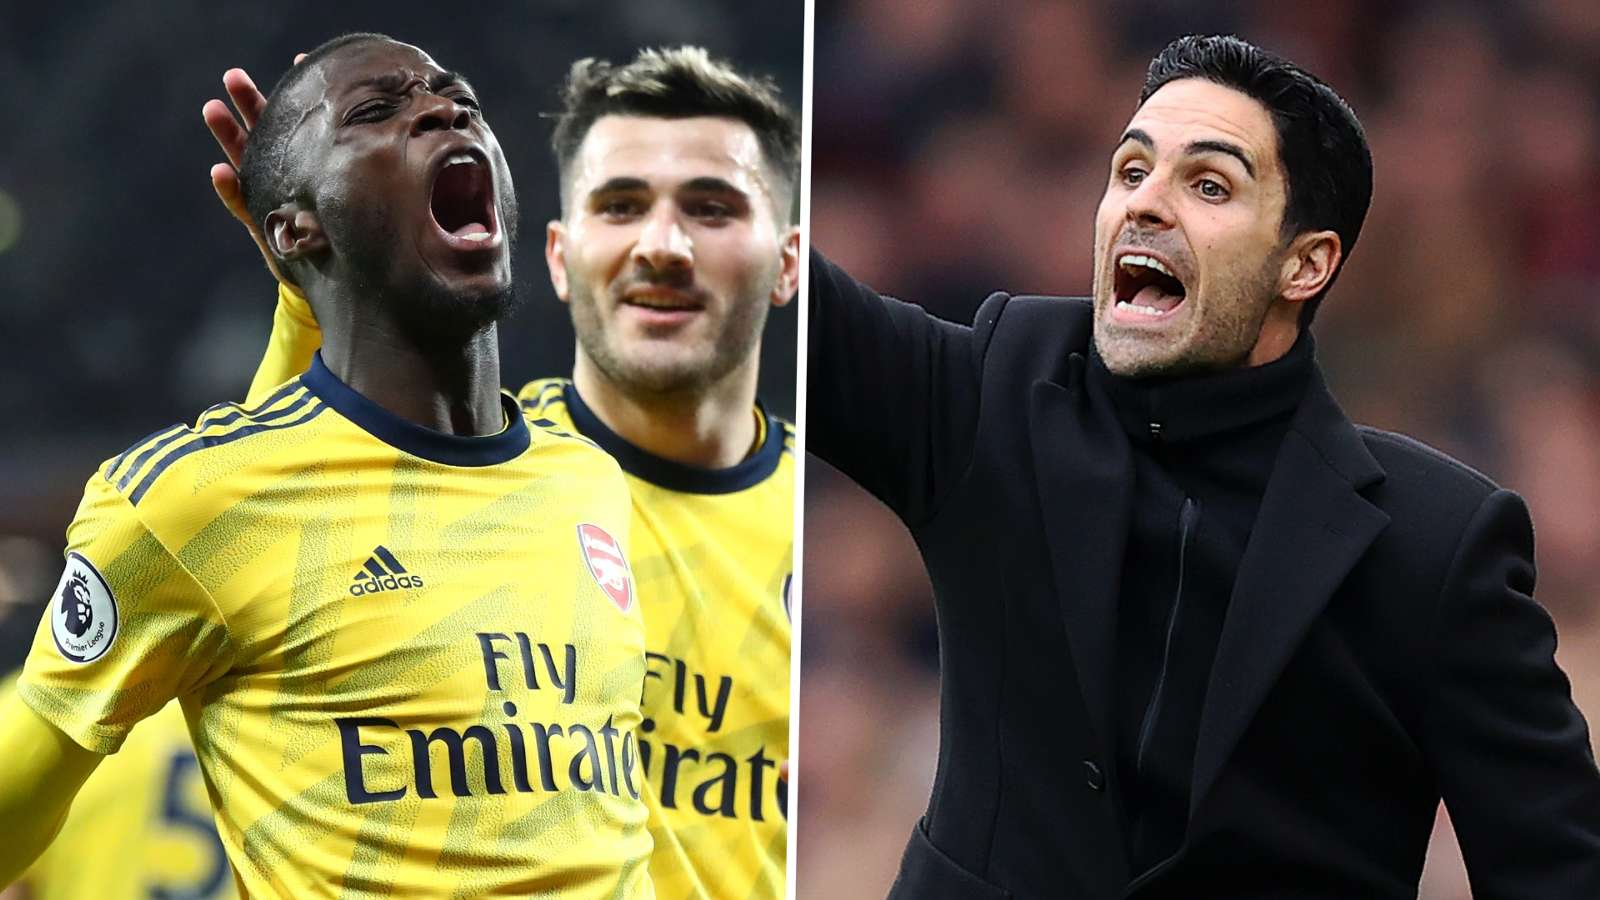 Nicolas Pepe Mikel Arteta Arsenal 2019-20 GFX